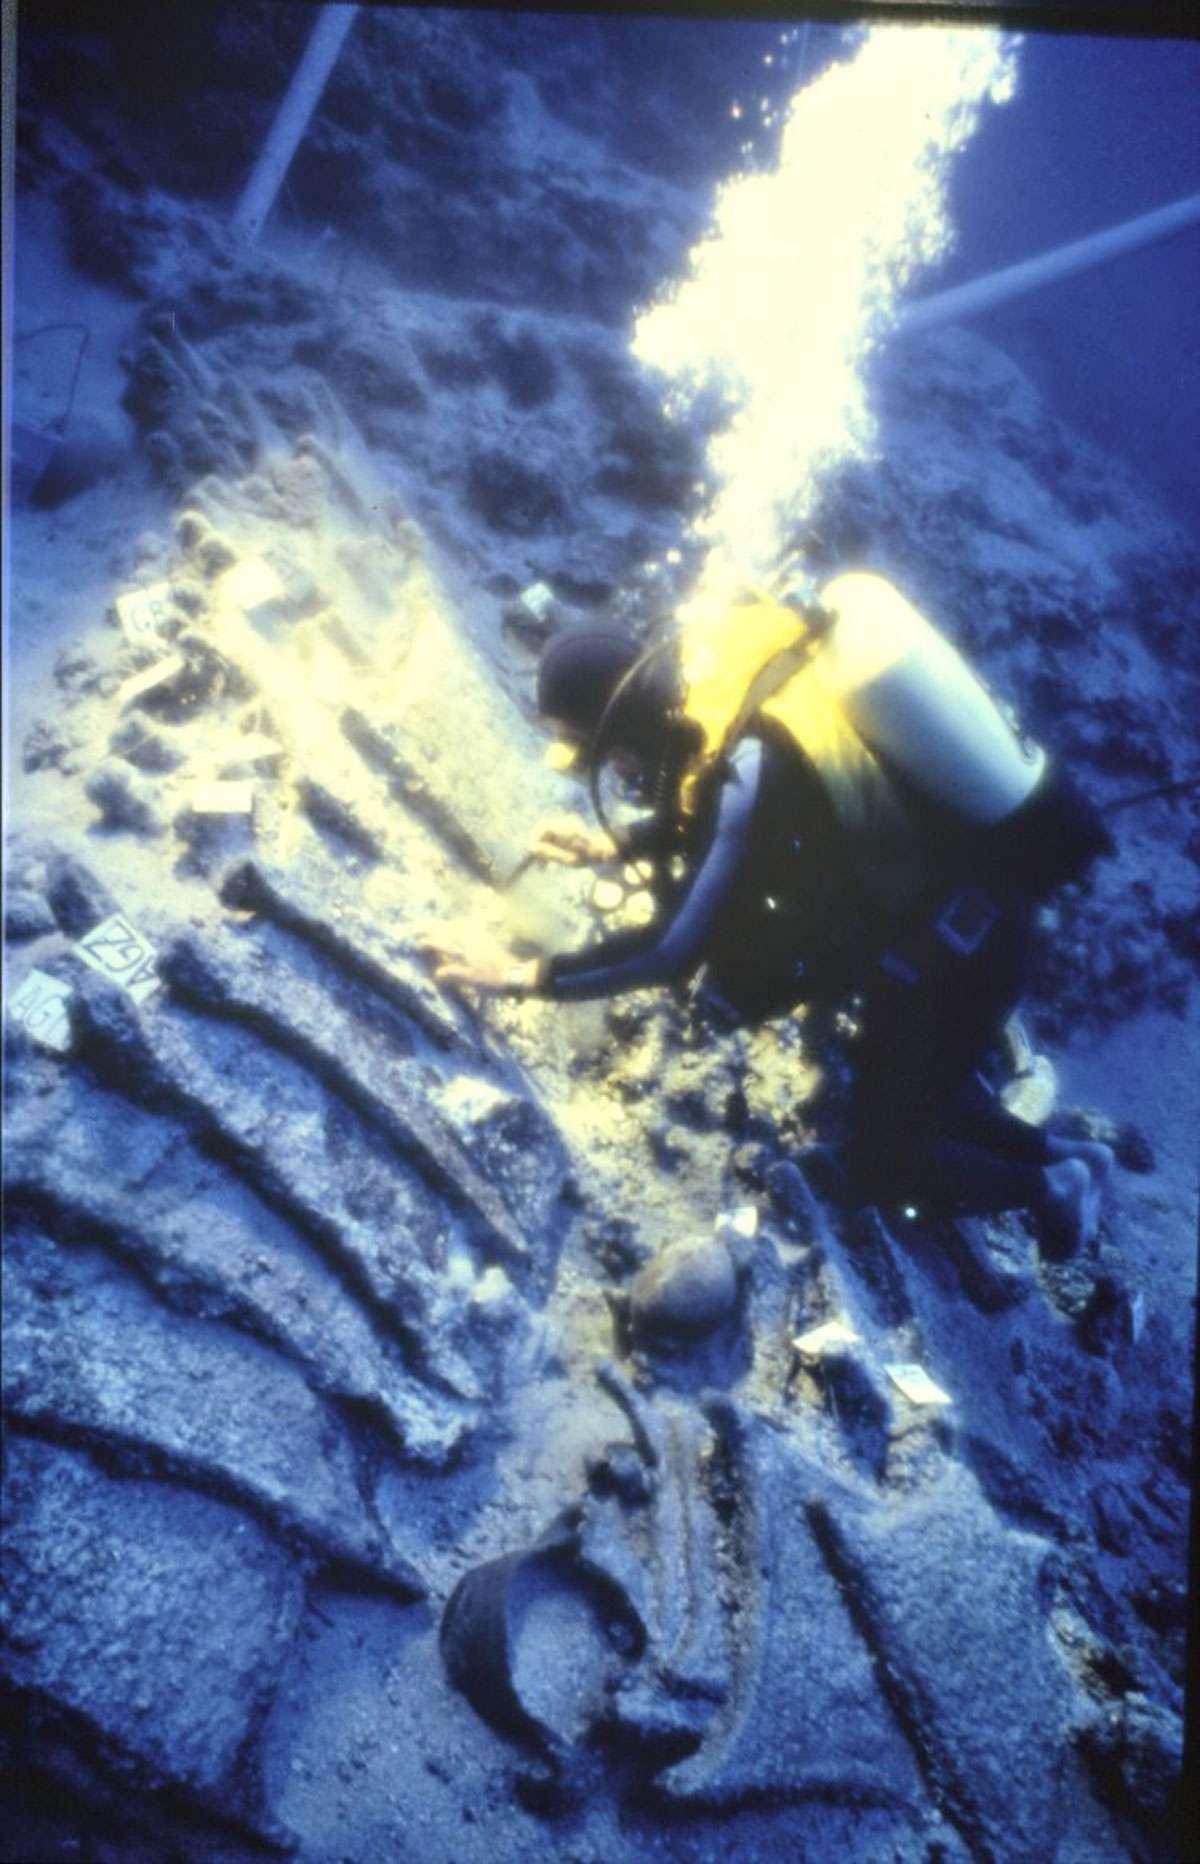 ULU BURUN shipwreck with Cypriot oxhide ingots